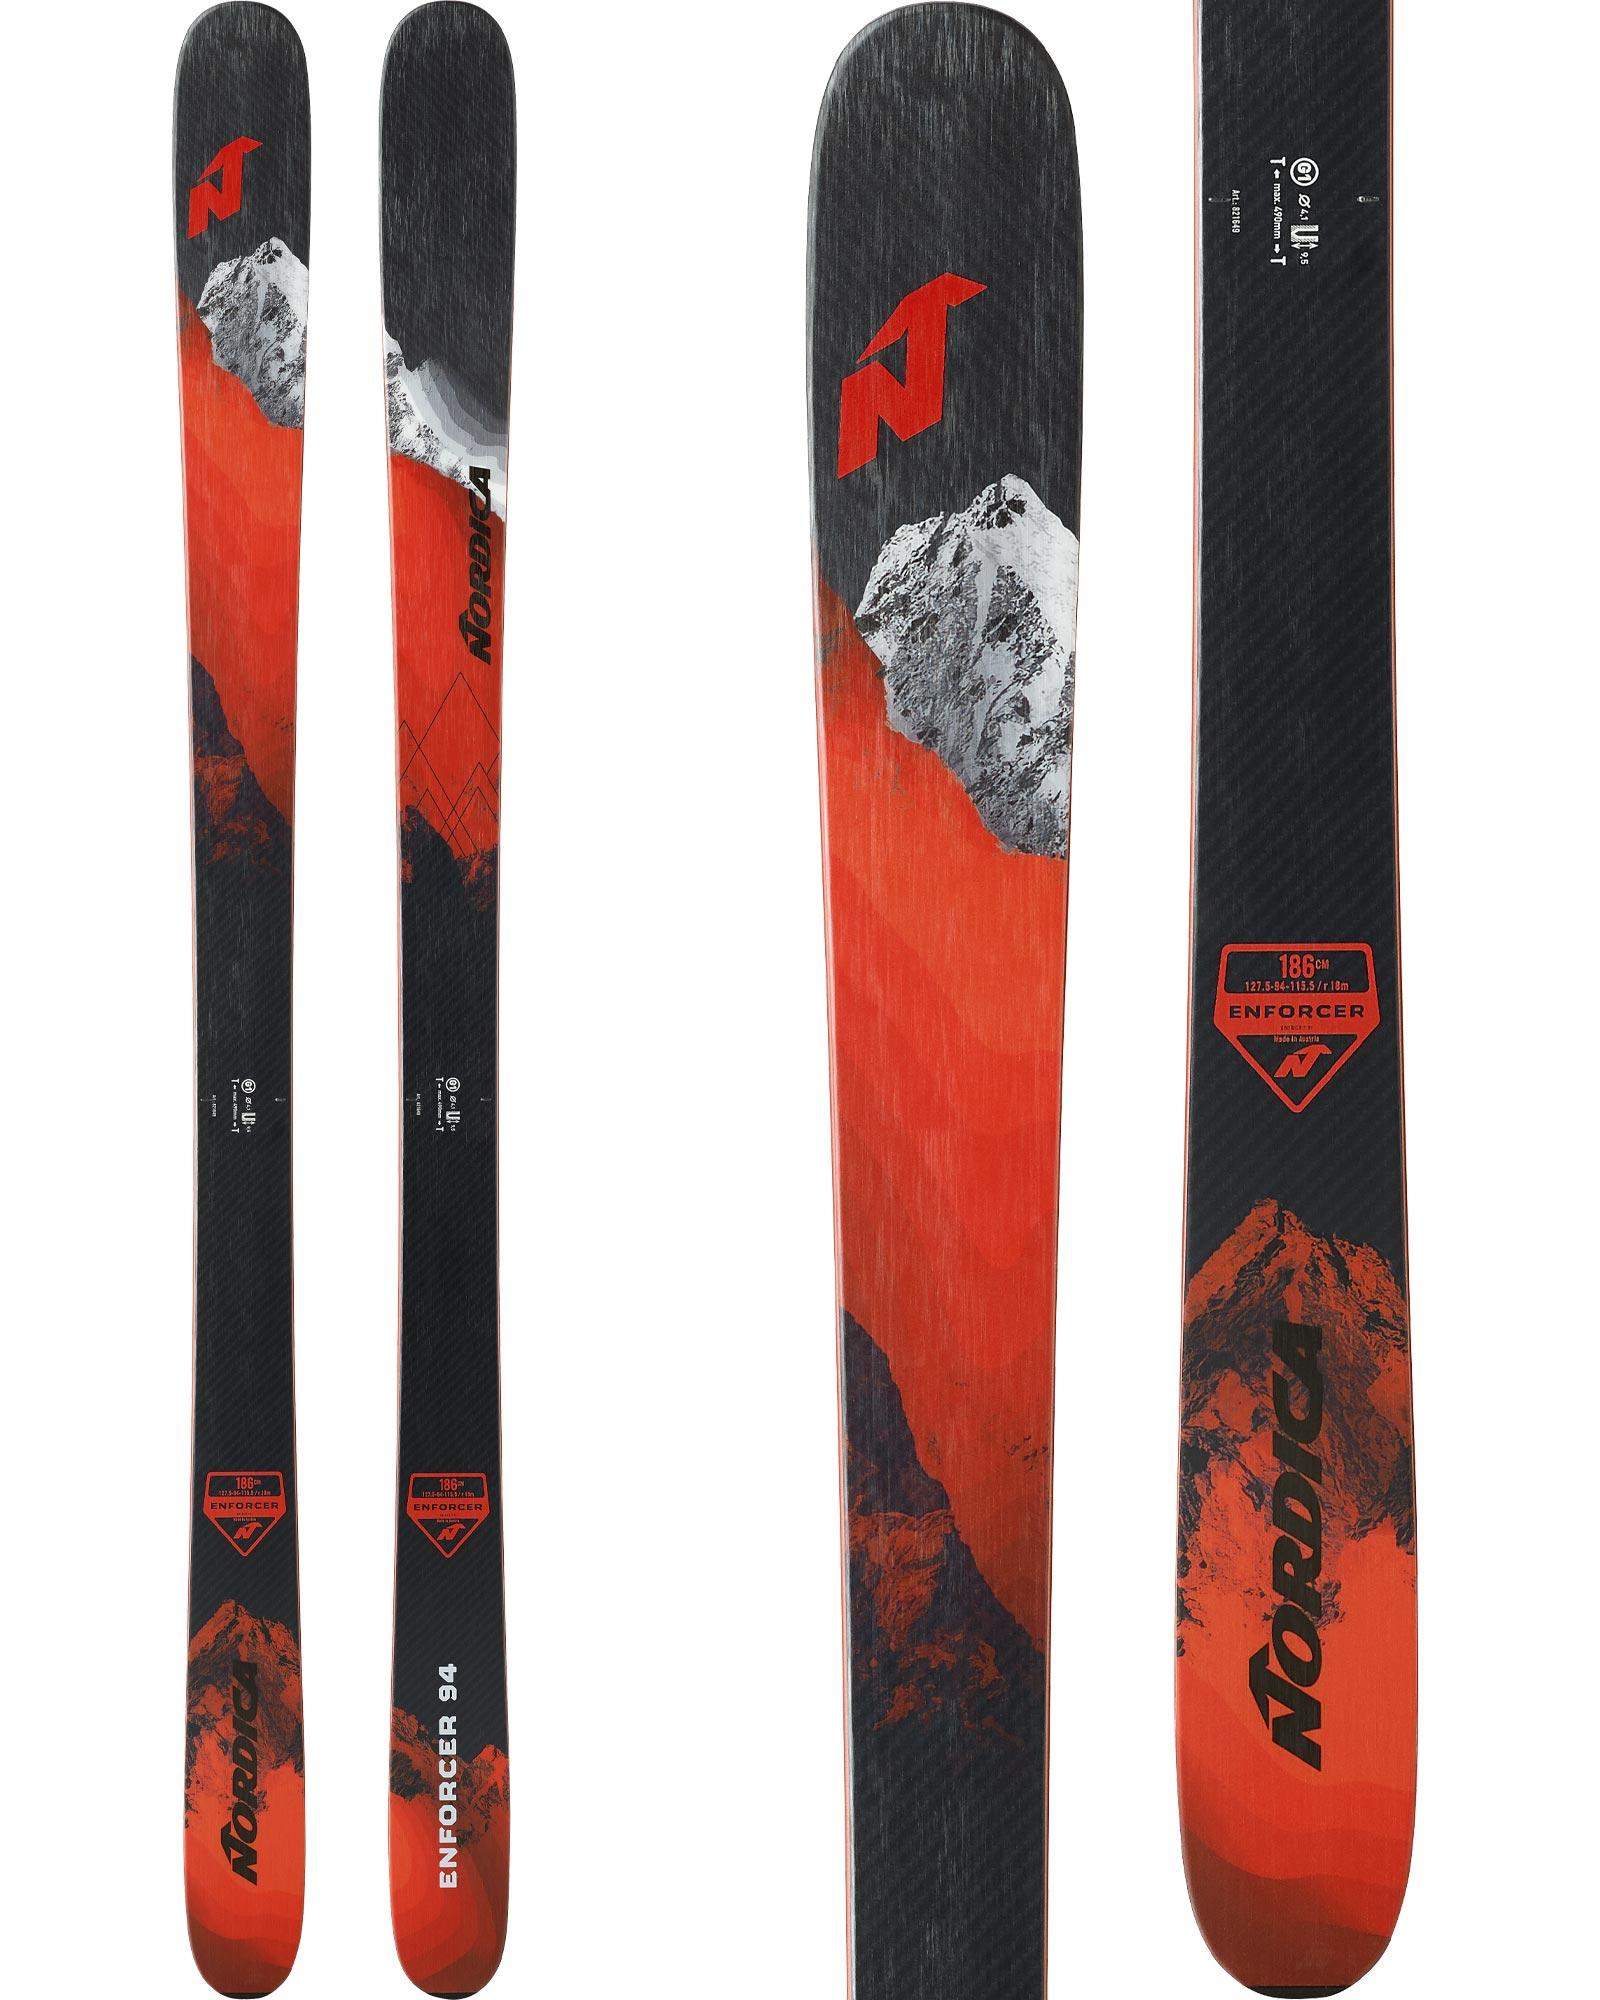 Nordica Men's Enforcer 94 Freeride Skis 2020 / 2021 0